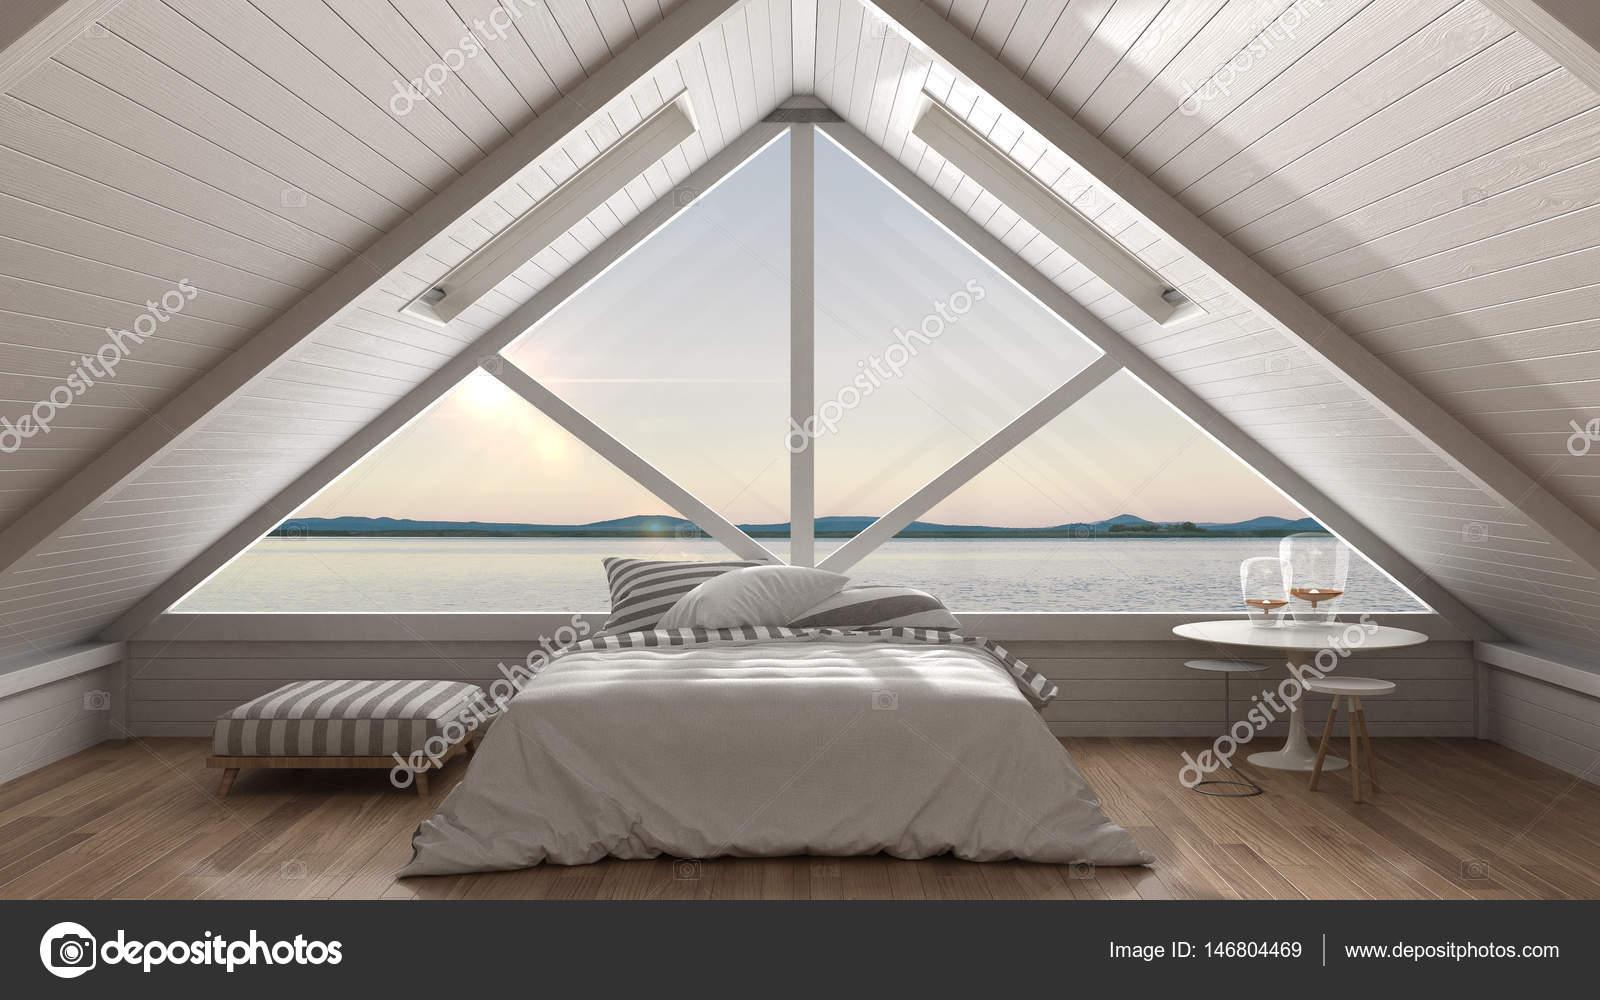 Klassieke mezzanine loft met groot raam en zee panorama